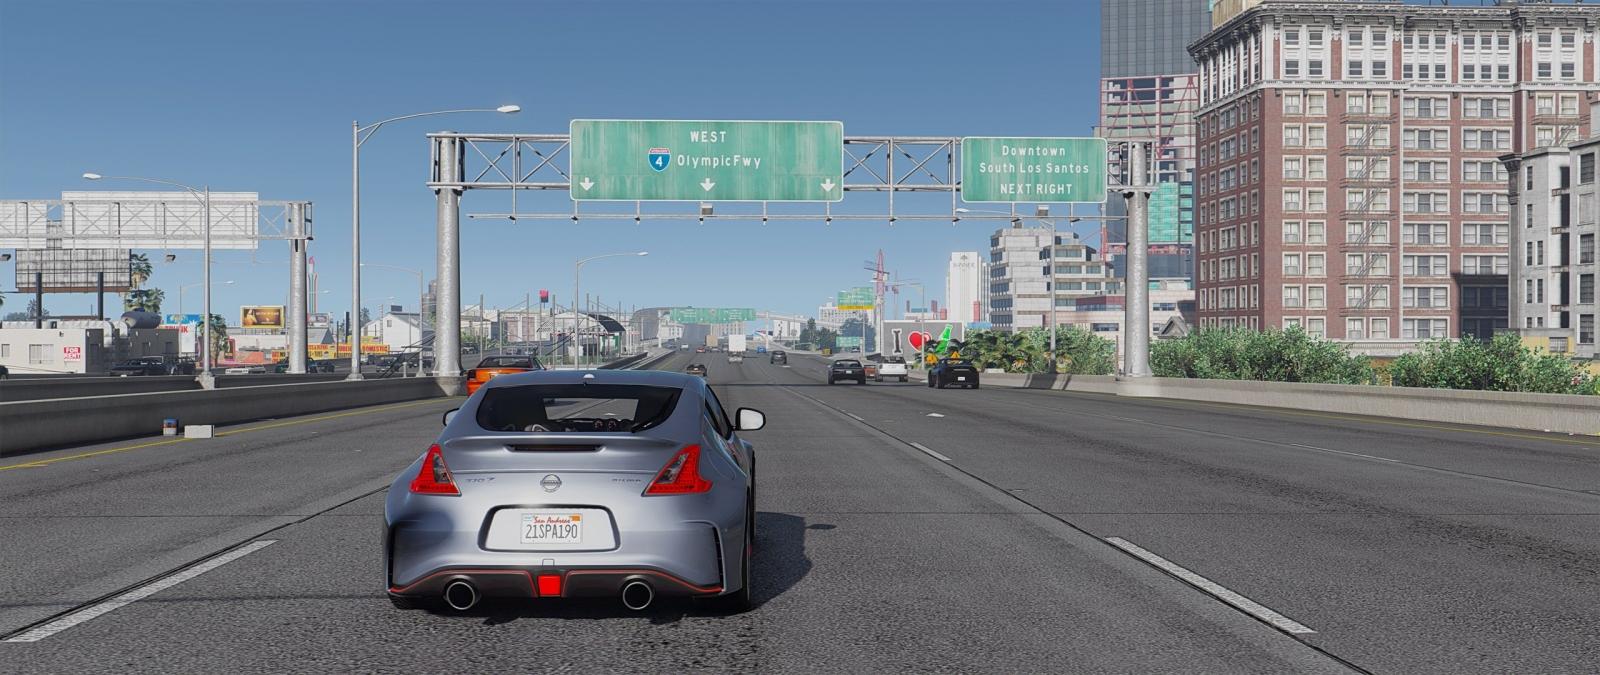 GTA 5 photorealistic mod